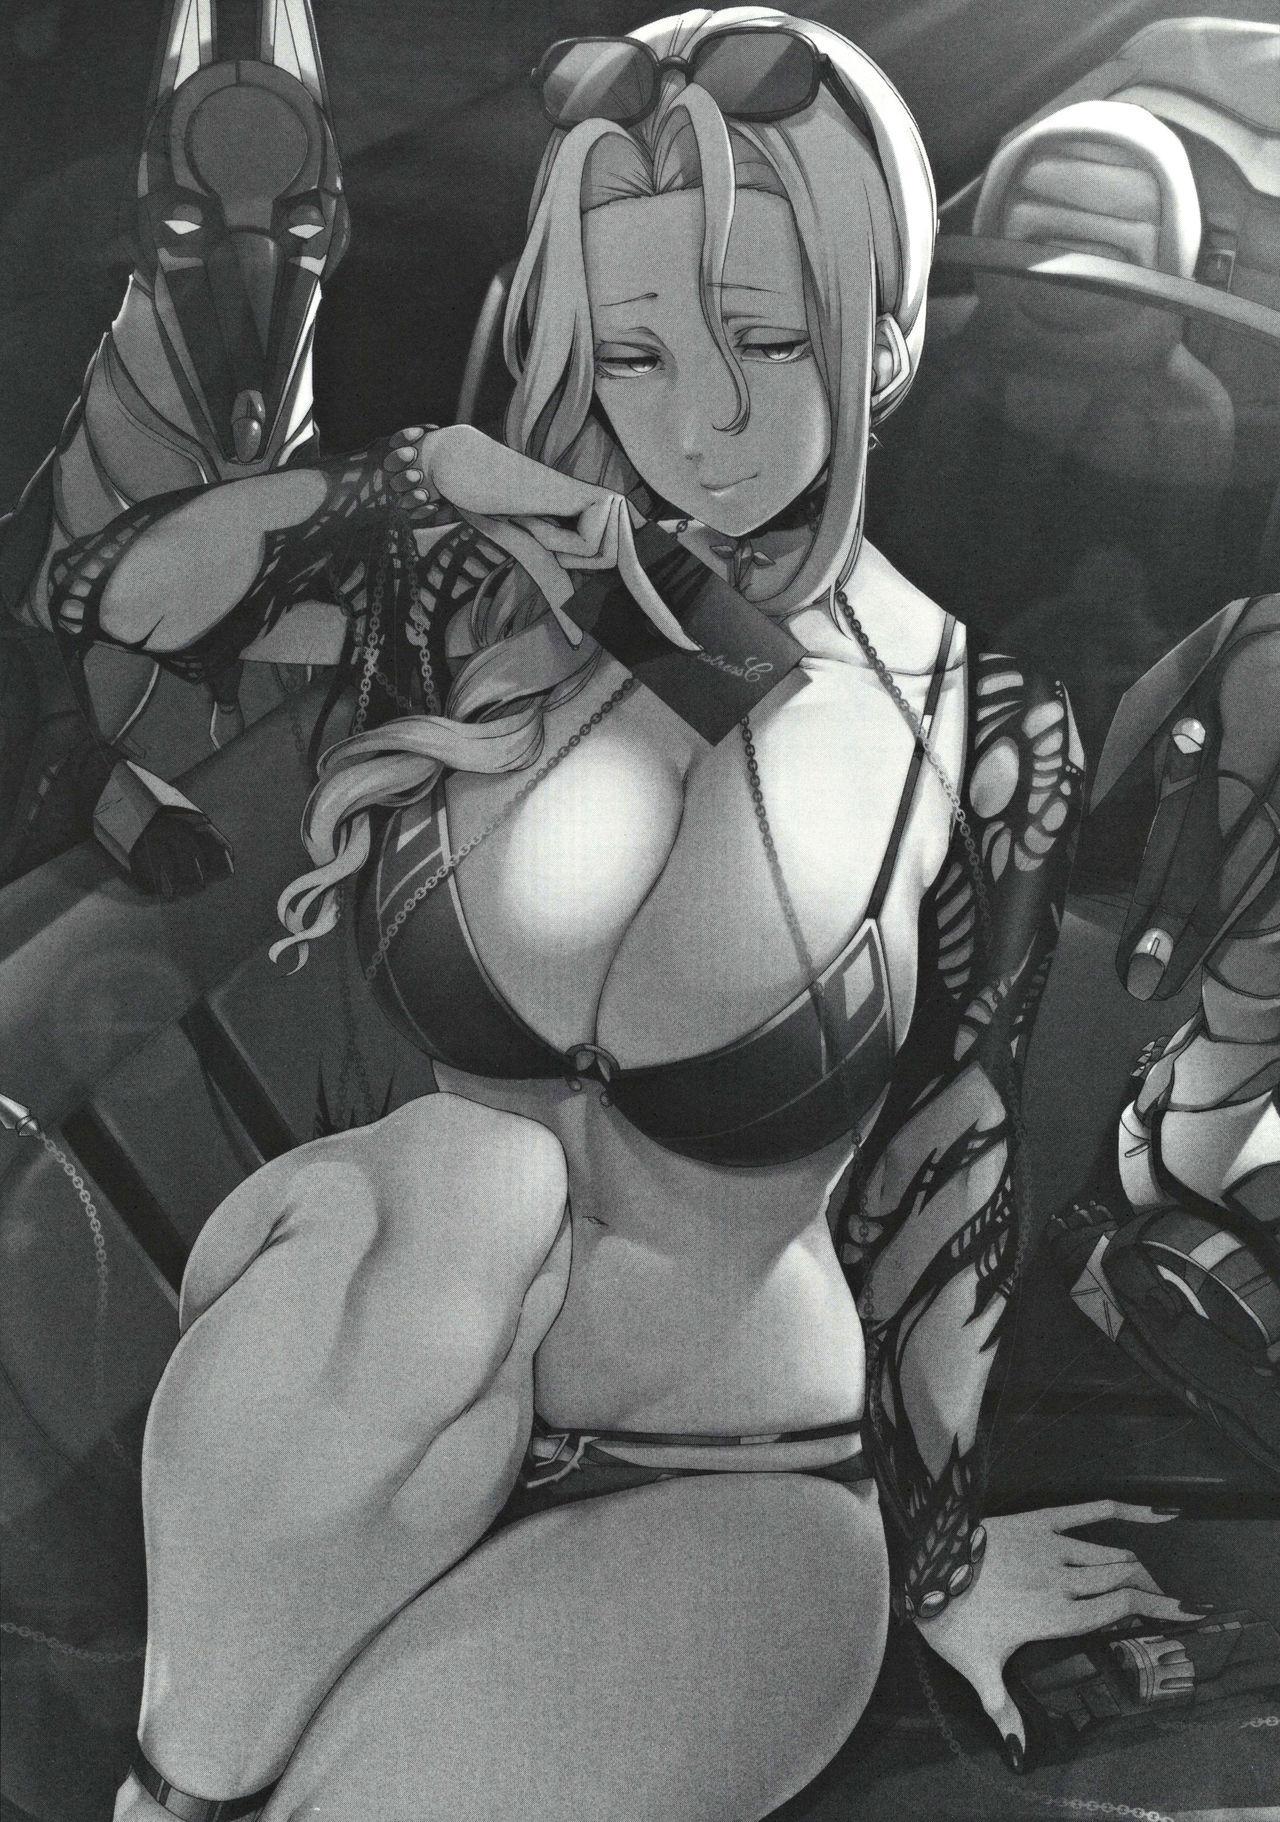 Carmilla-san no Ecchi na no ga Kakitakatta Hon | I Wanted To Draw A Book About Carmilla's Sexiness 26